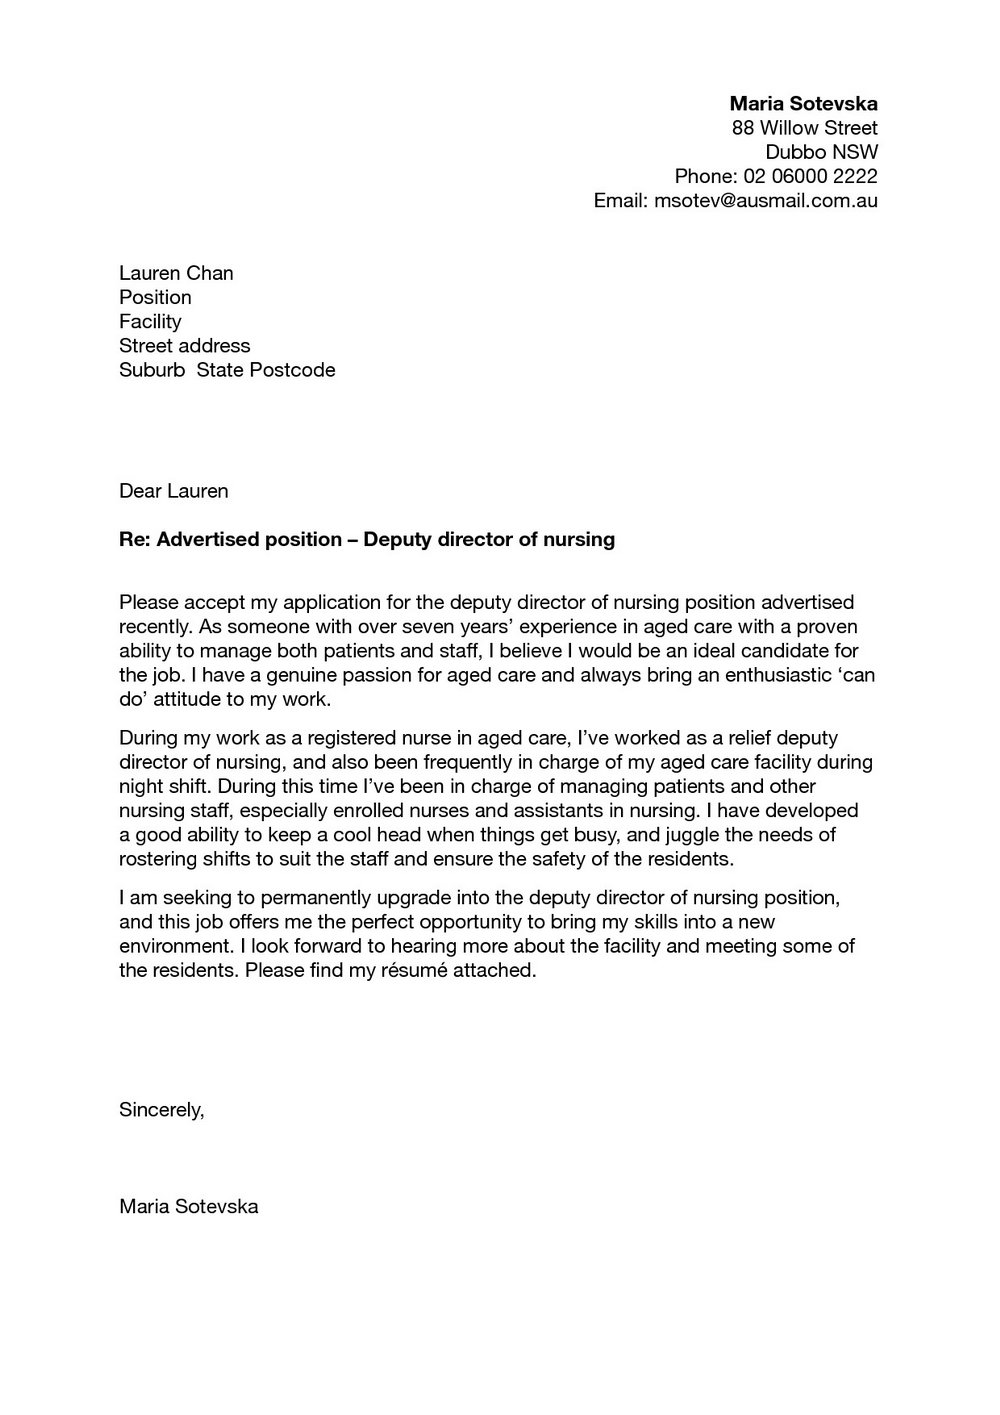 Nursing Resume Cover Letter Template Free